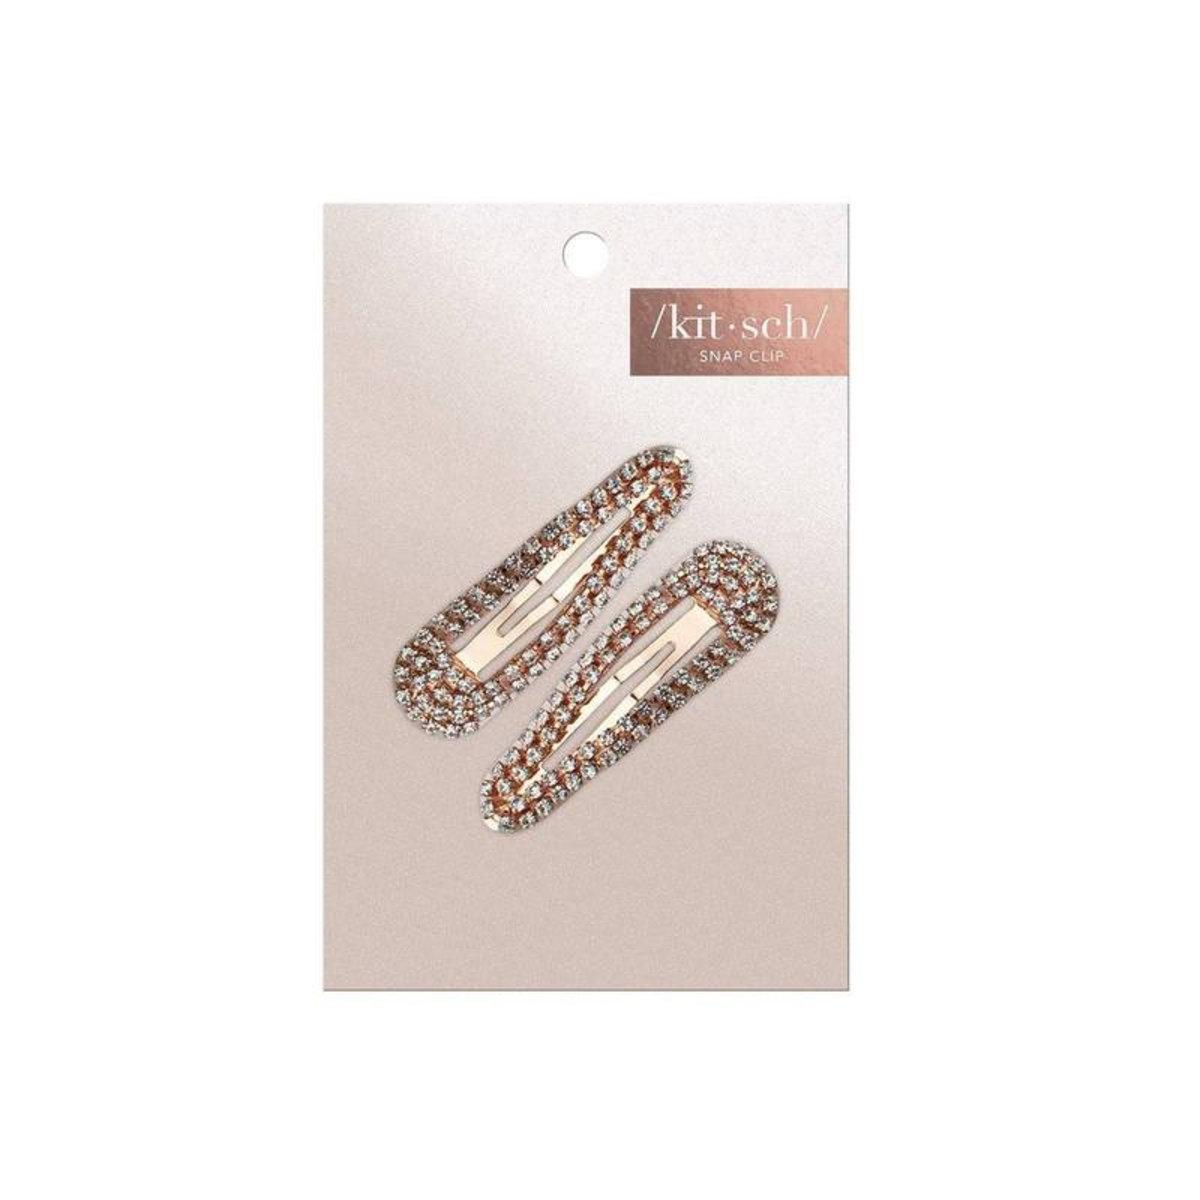 Kitsch x Justine Marjan Rhinestone Snap Clip Rose Gold 2pc